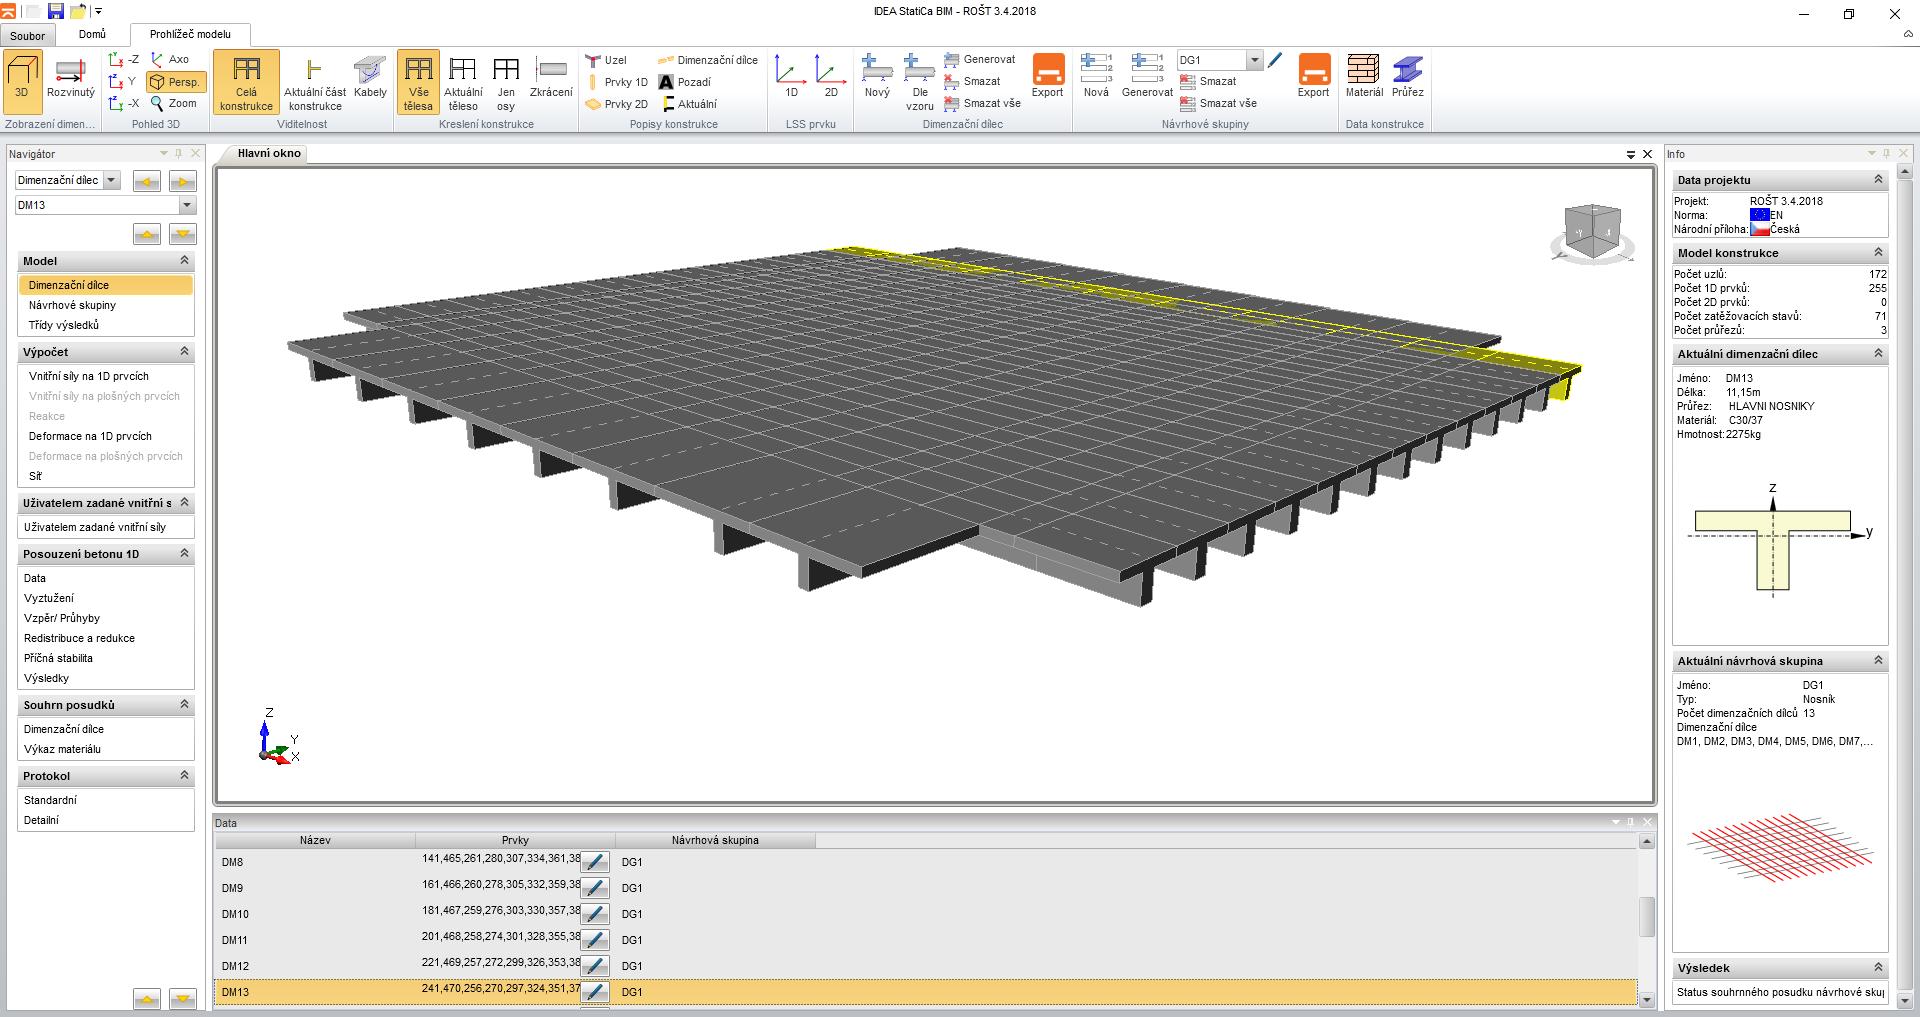 The prestressed concrete roof slab lightened by polystyrene blocks